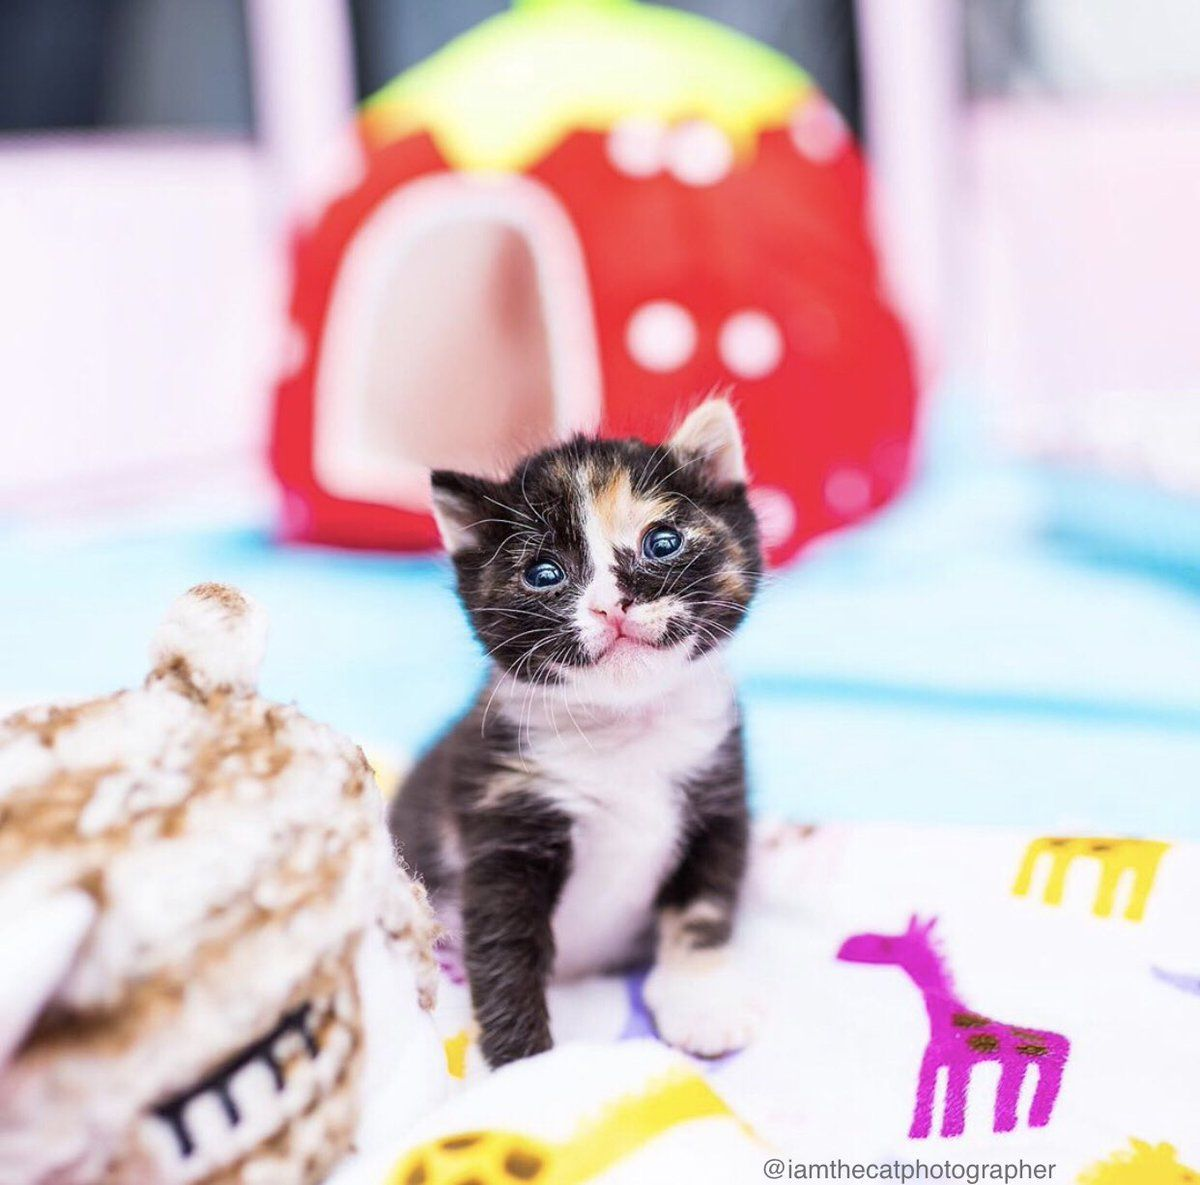 Lana Miller On Twitter Kitten Pictures Kittens Cutest Kittens